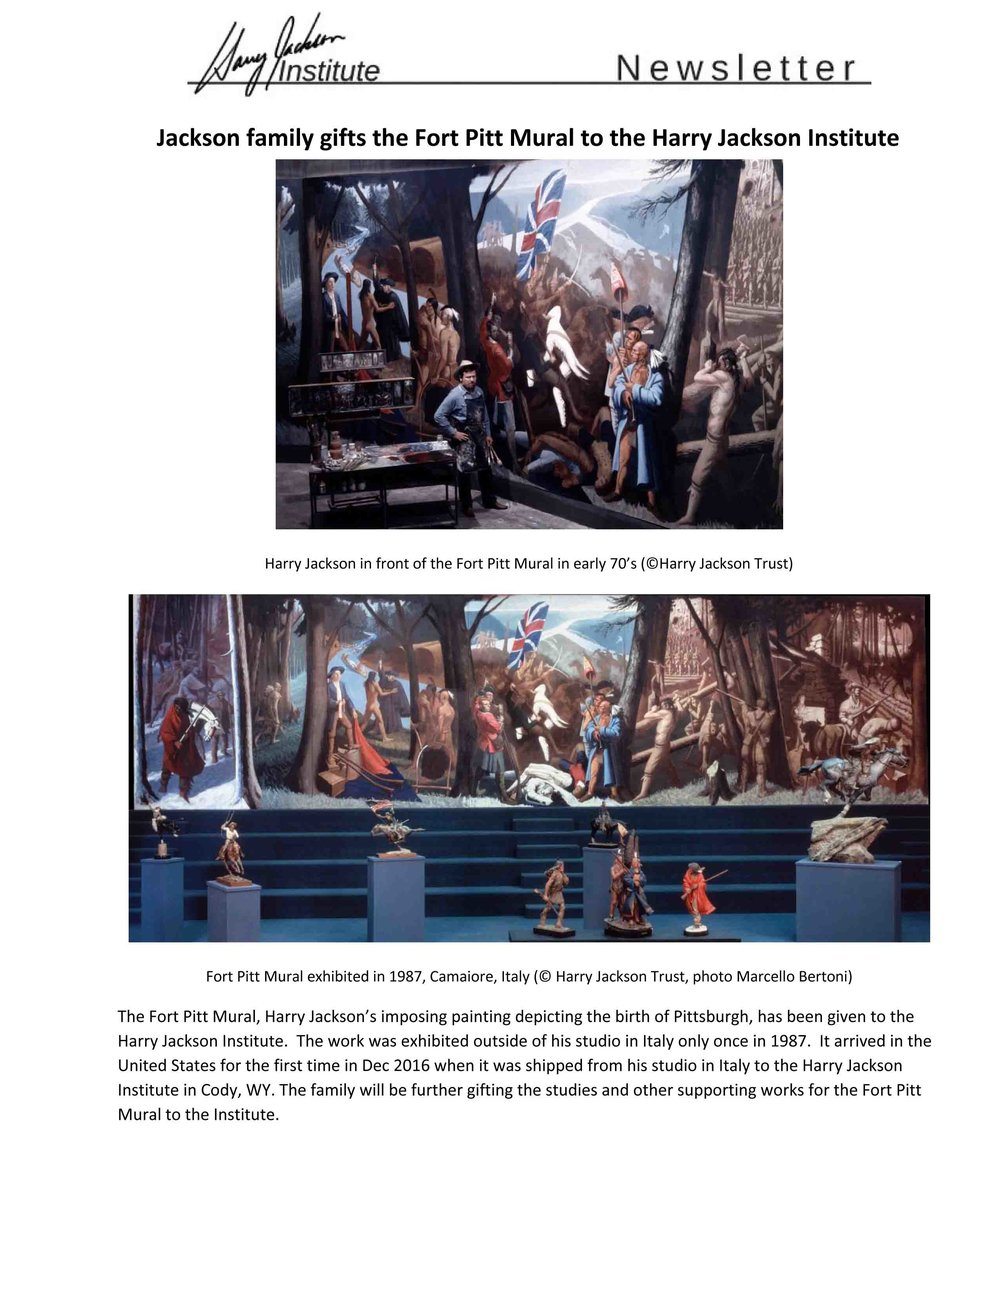 2017_10_01 Harry Jackson Iinstitute Newsletter-9.jpg